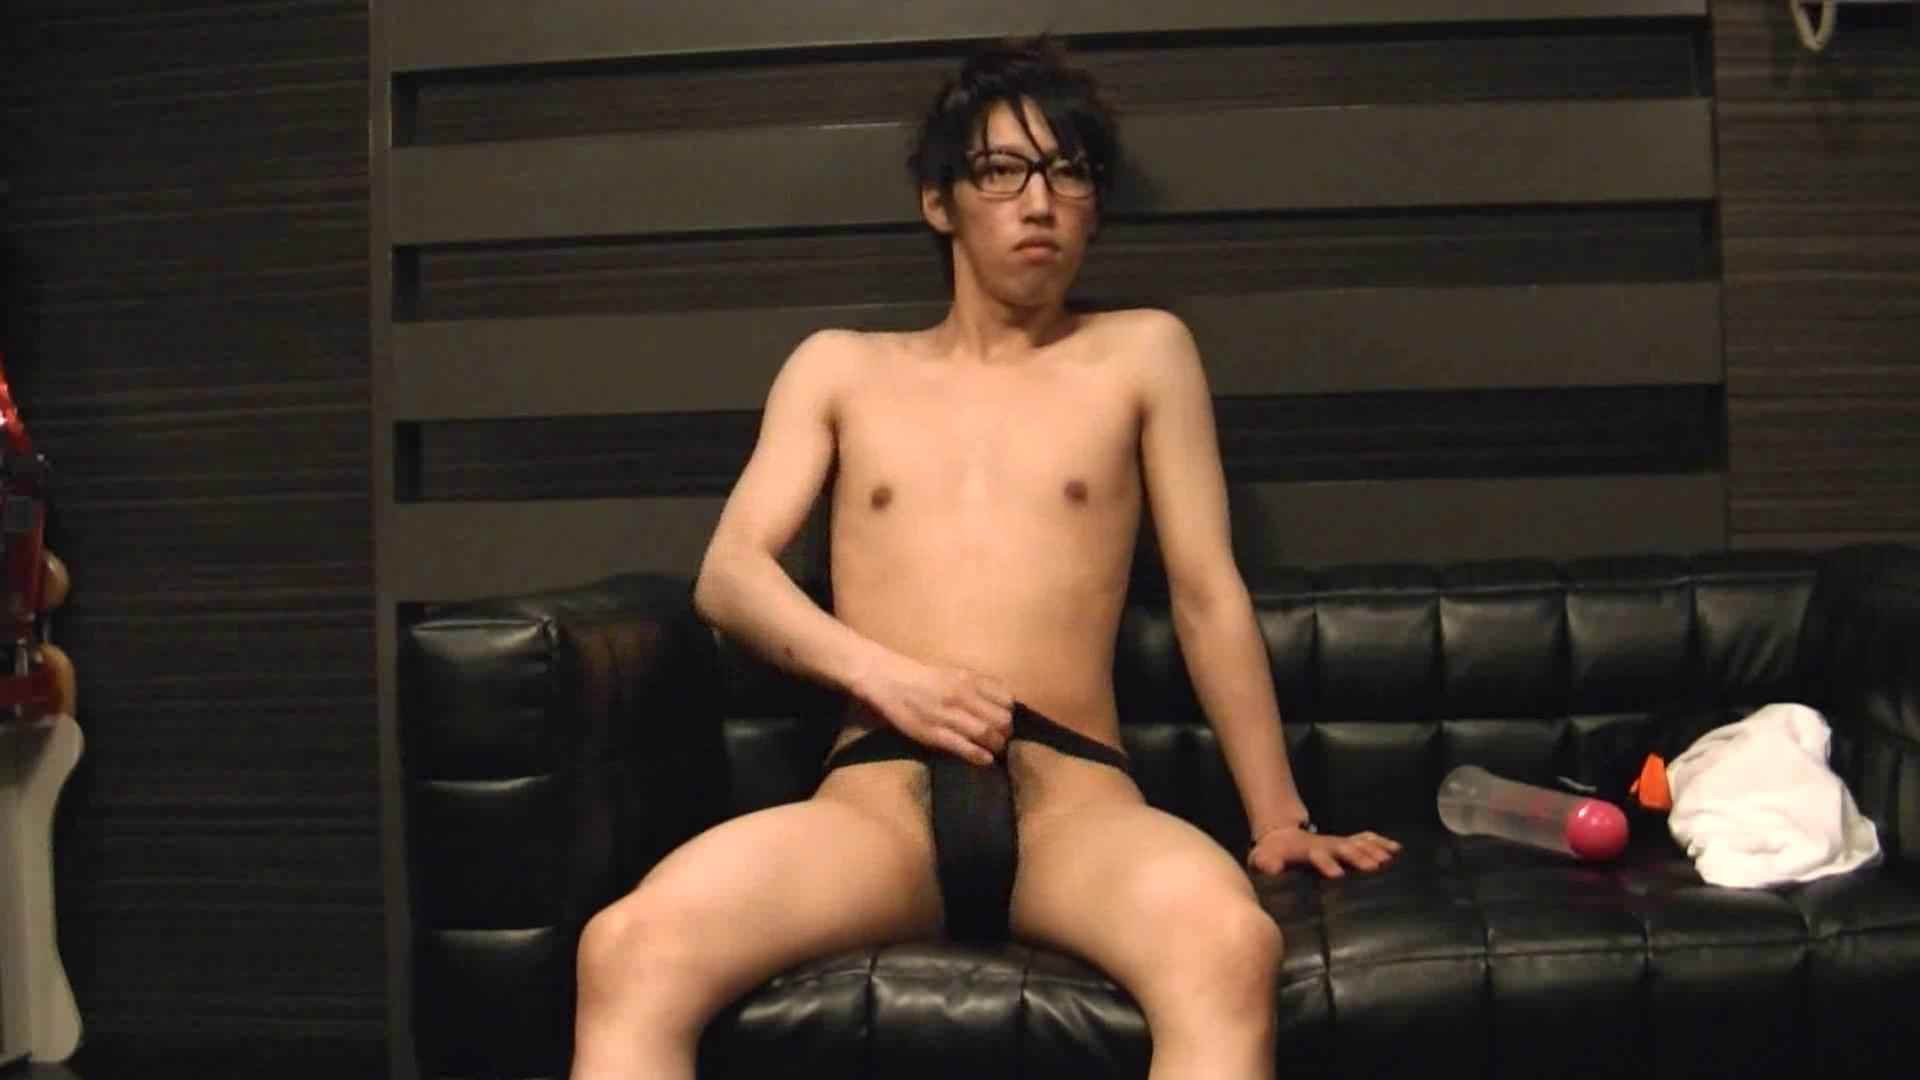 ONA見せカーニバル!! Vol3 男 ゲイ無料無修正画像 89枚 31